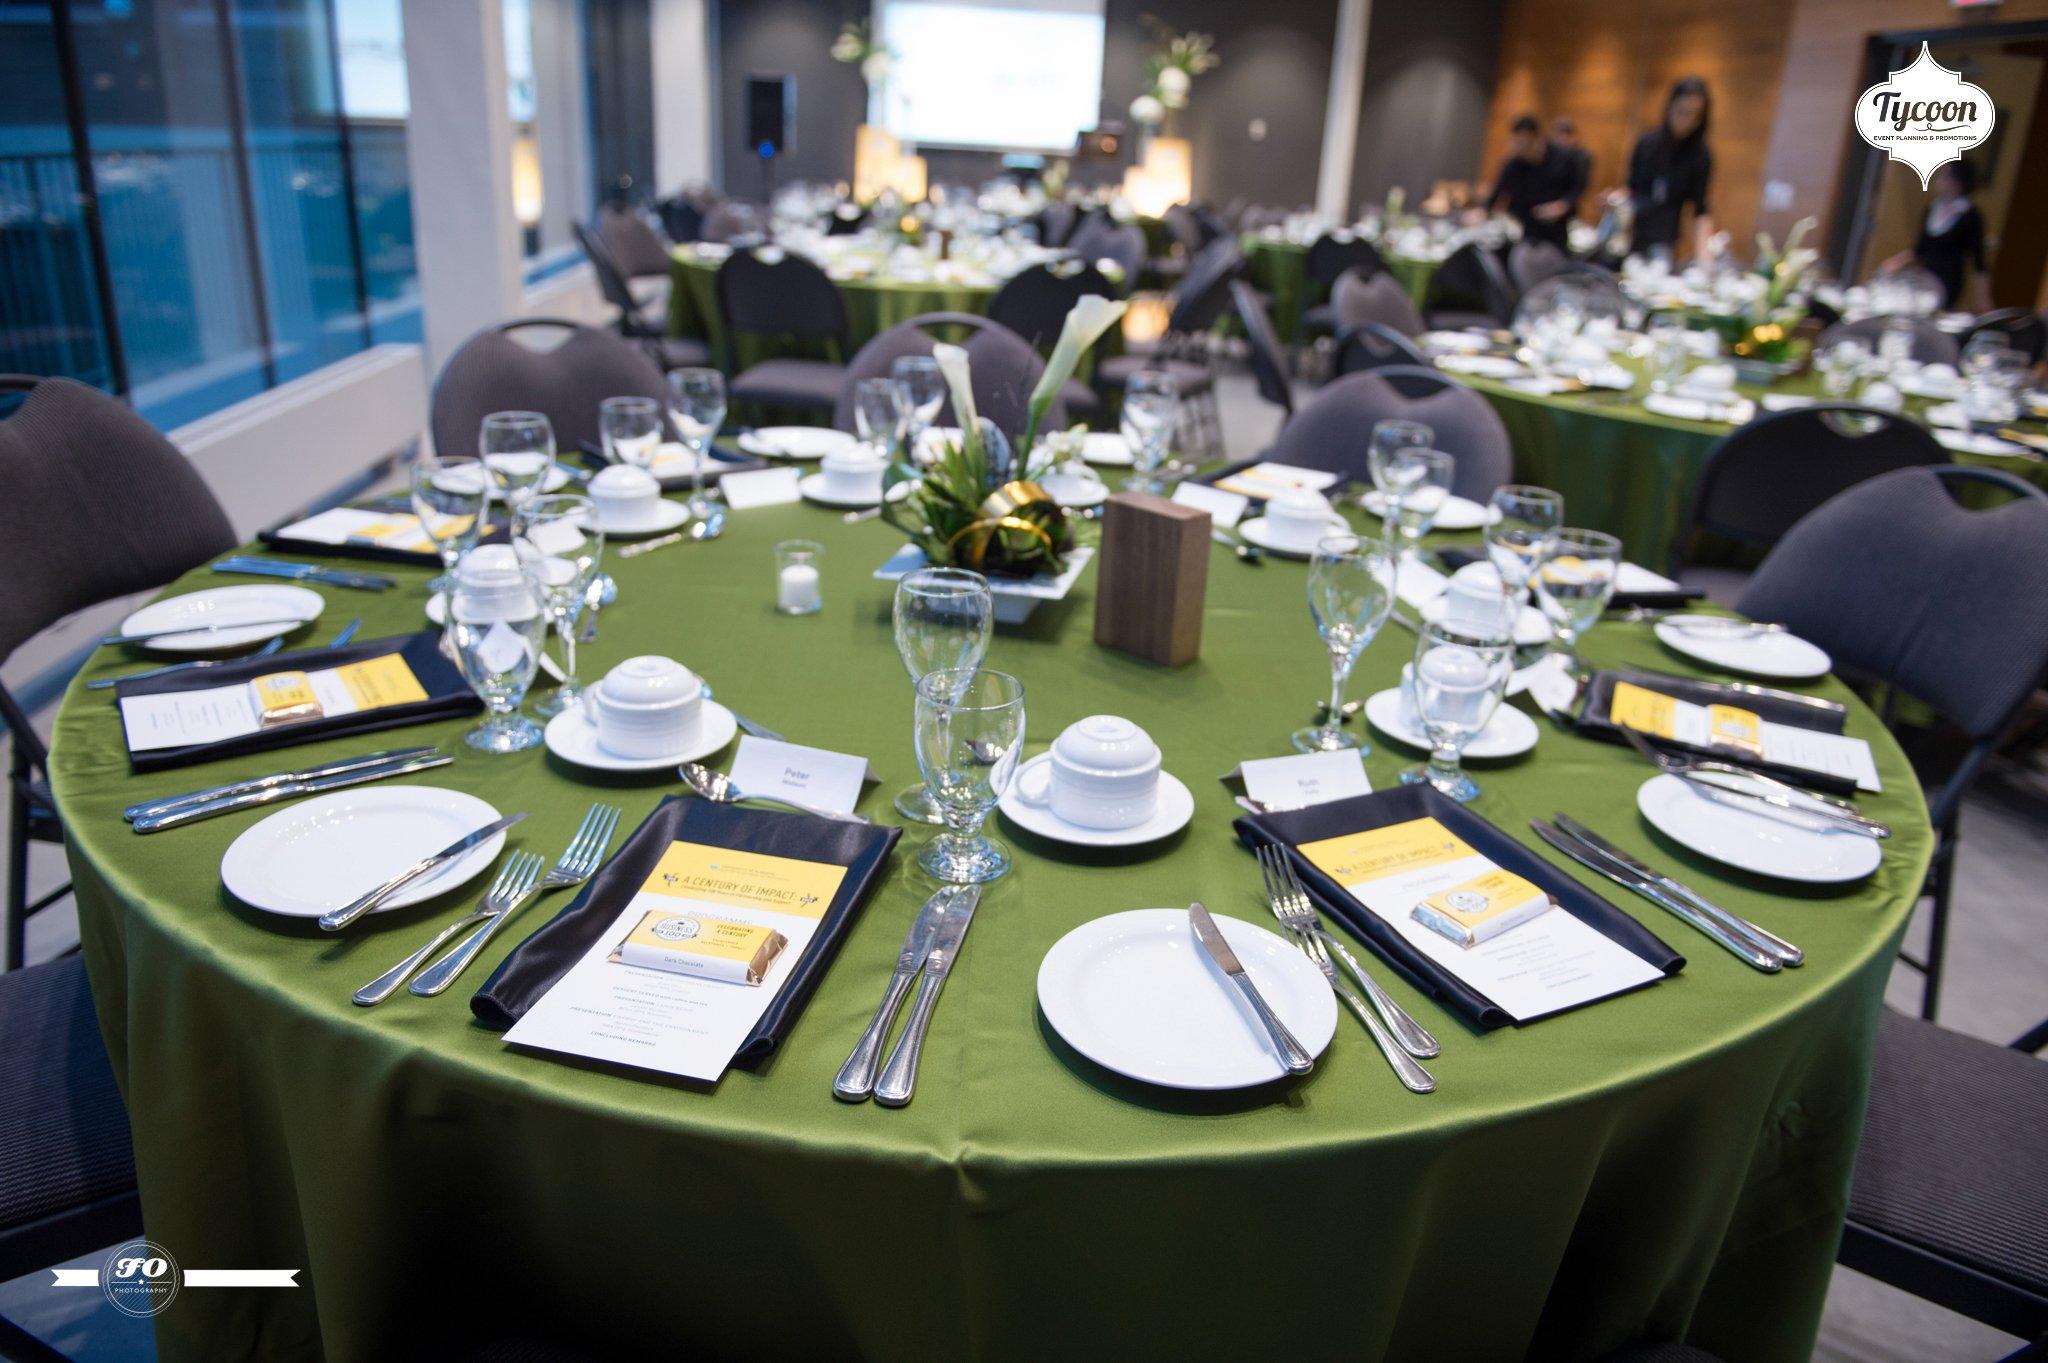 alberta school of business vip reception  u0026 dinner  u2013 tycoon